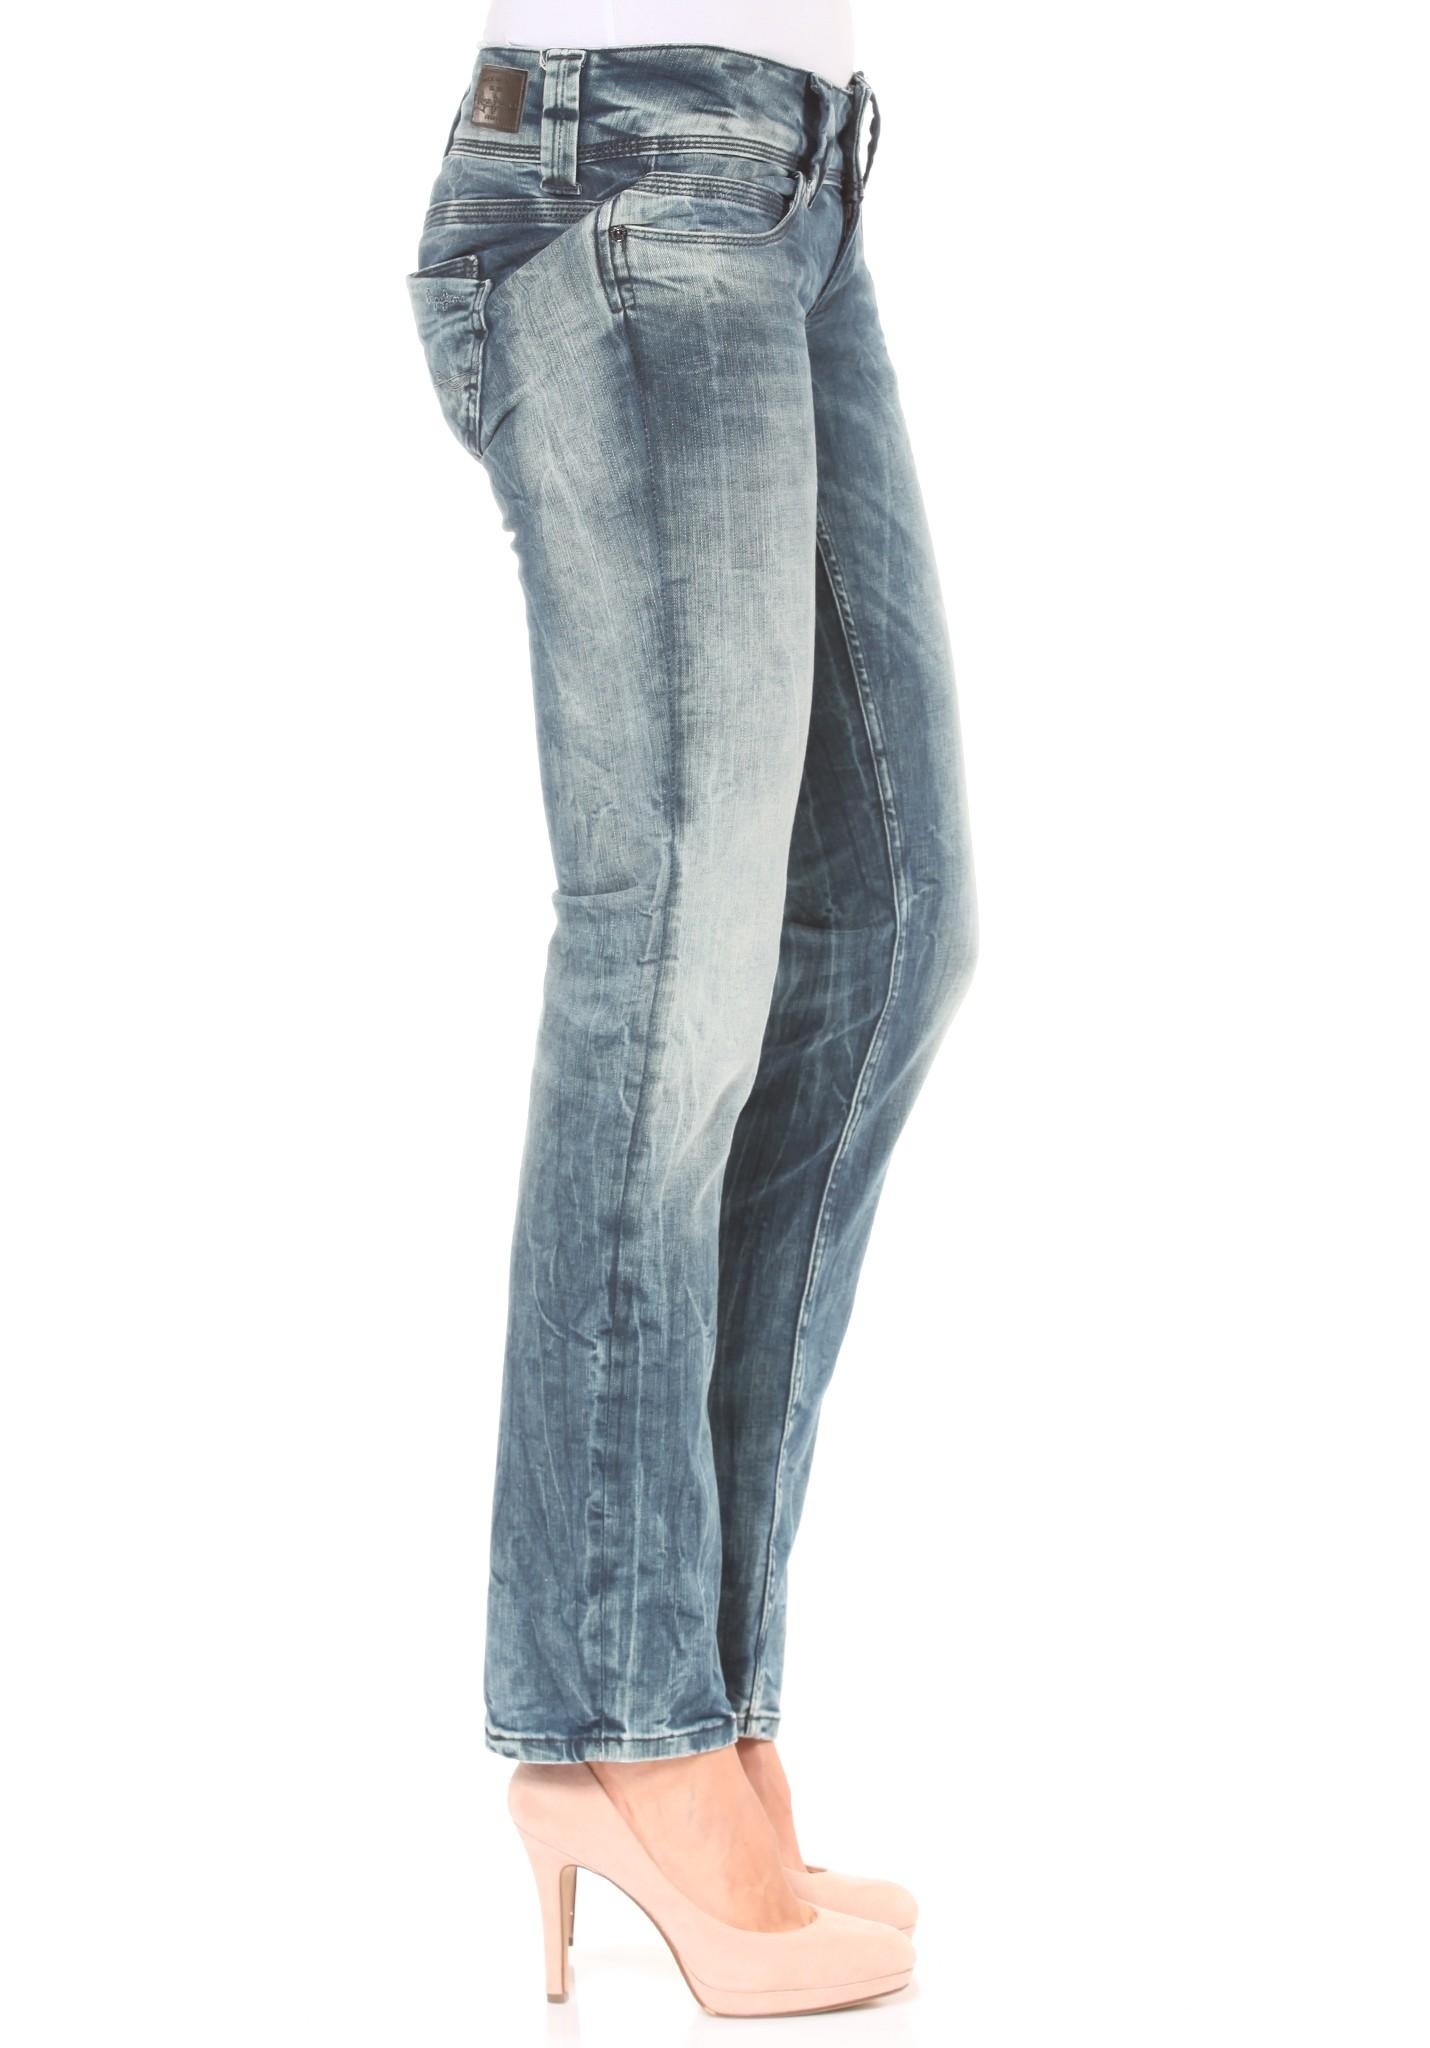 neu pepe jeans venus damen jeans hose ebay. Black Bedroom Furniture Sets. Home Design Ideas